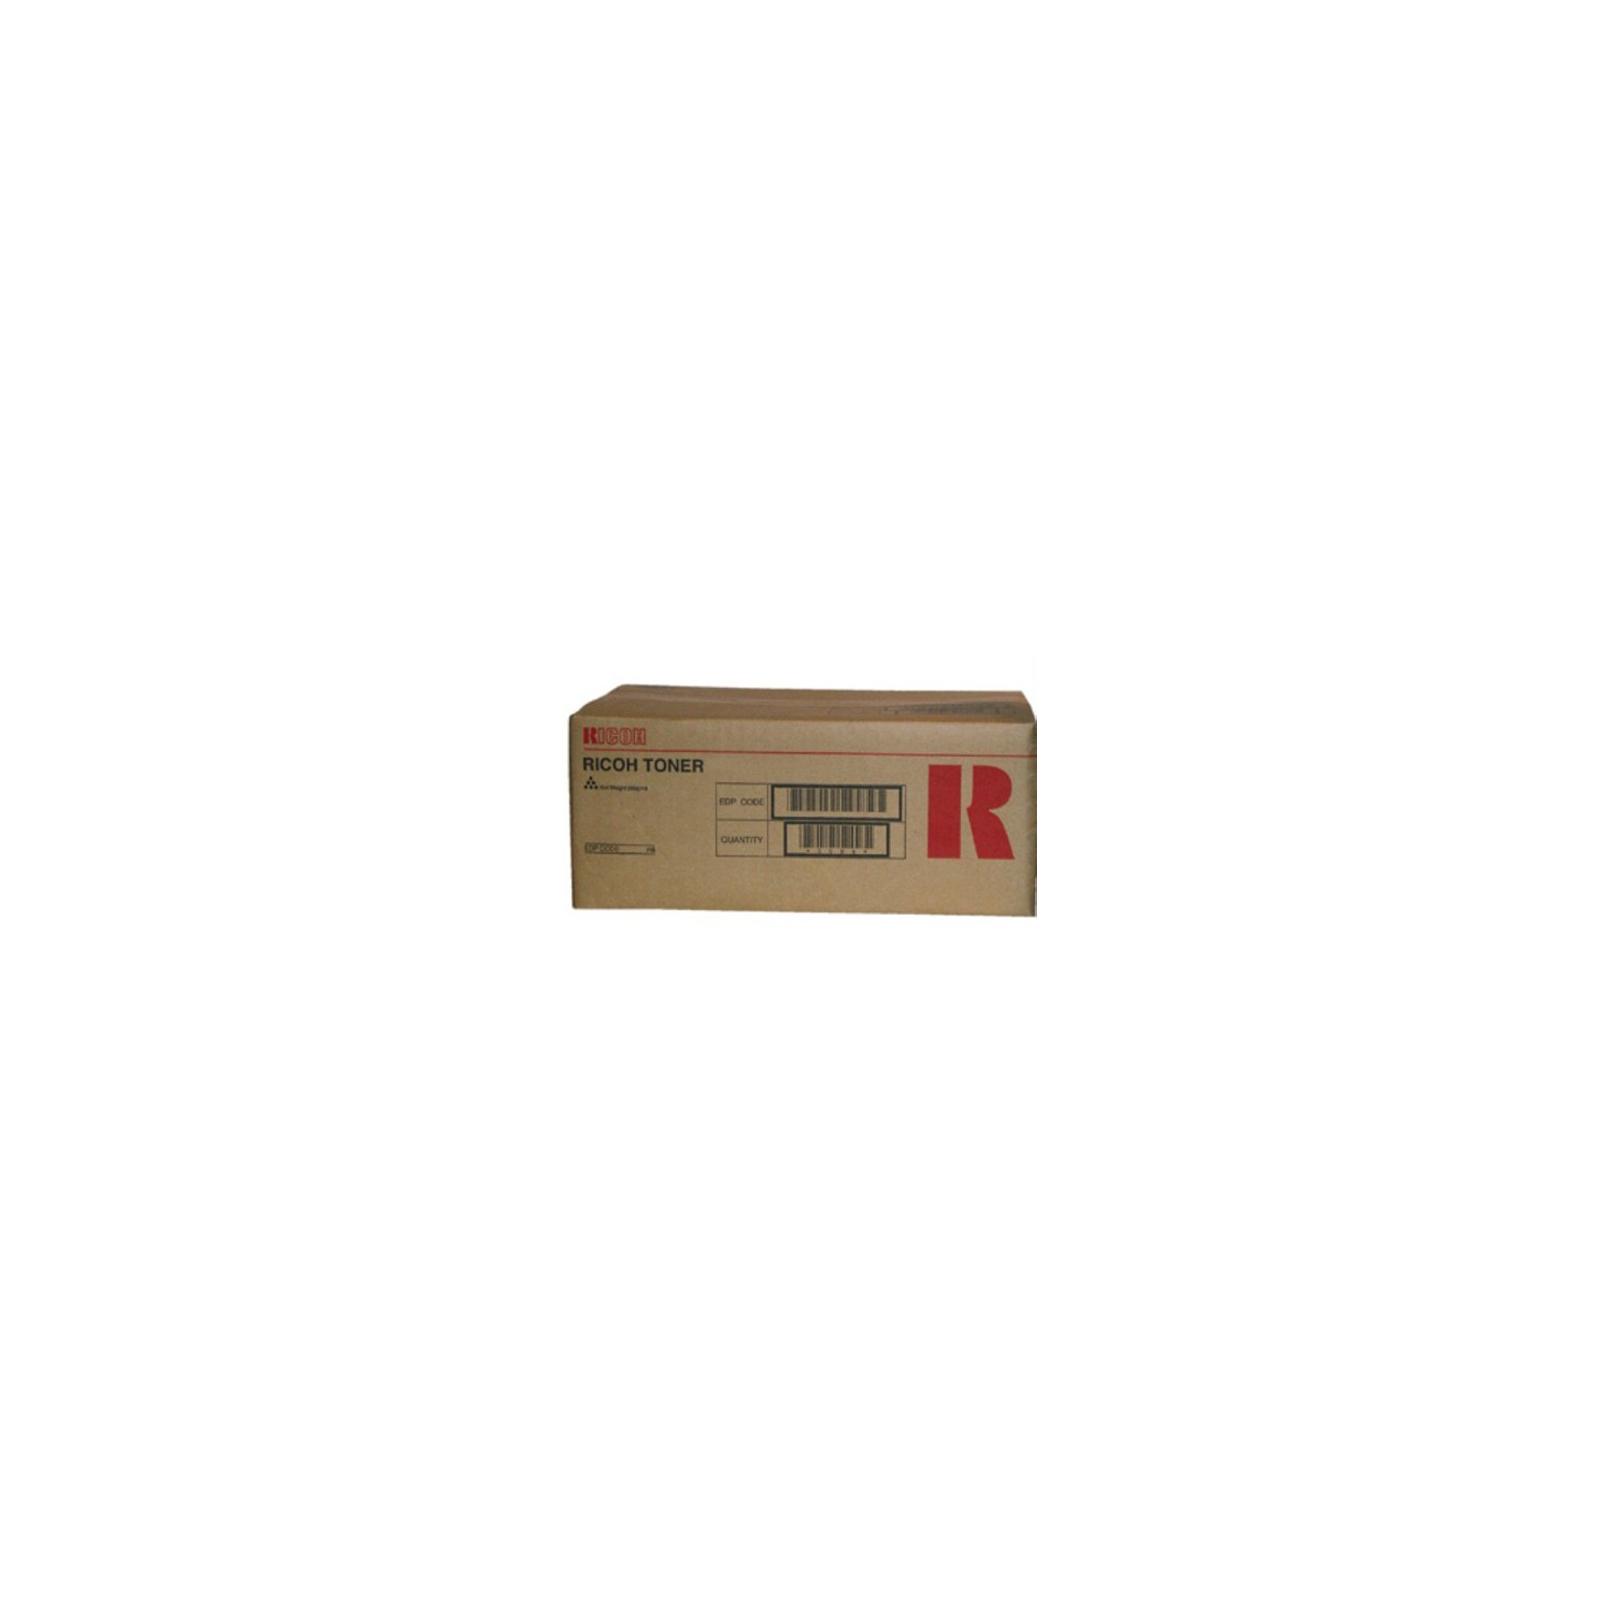 Тонер-картридж Ricoh TOMP4500EFR2 Black 30К (MP3500/MP4000/MP4500/MP5000/MP4001) (841347) изображение 3